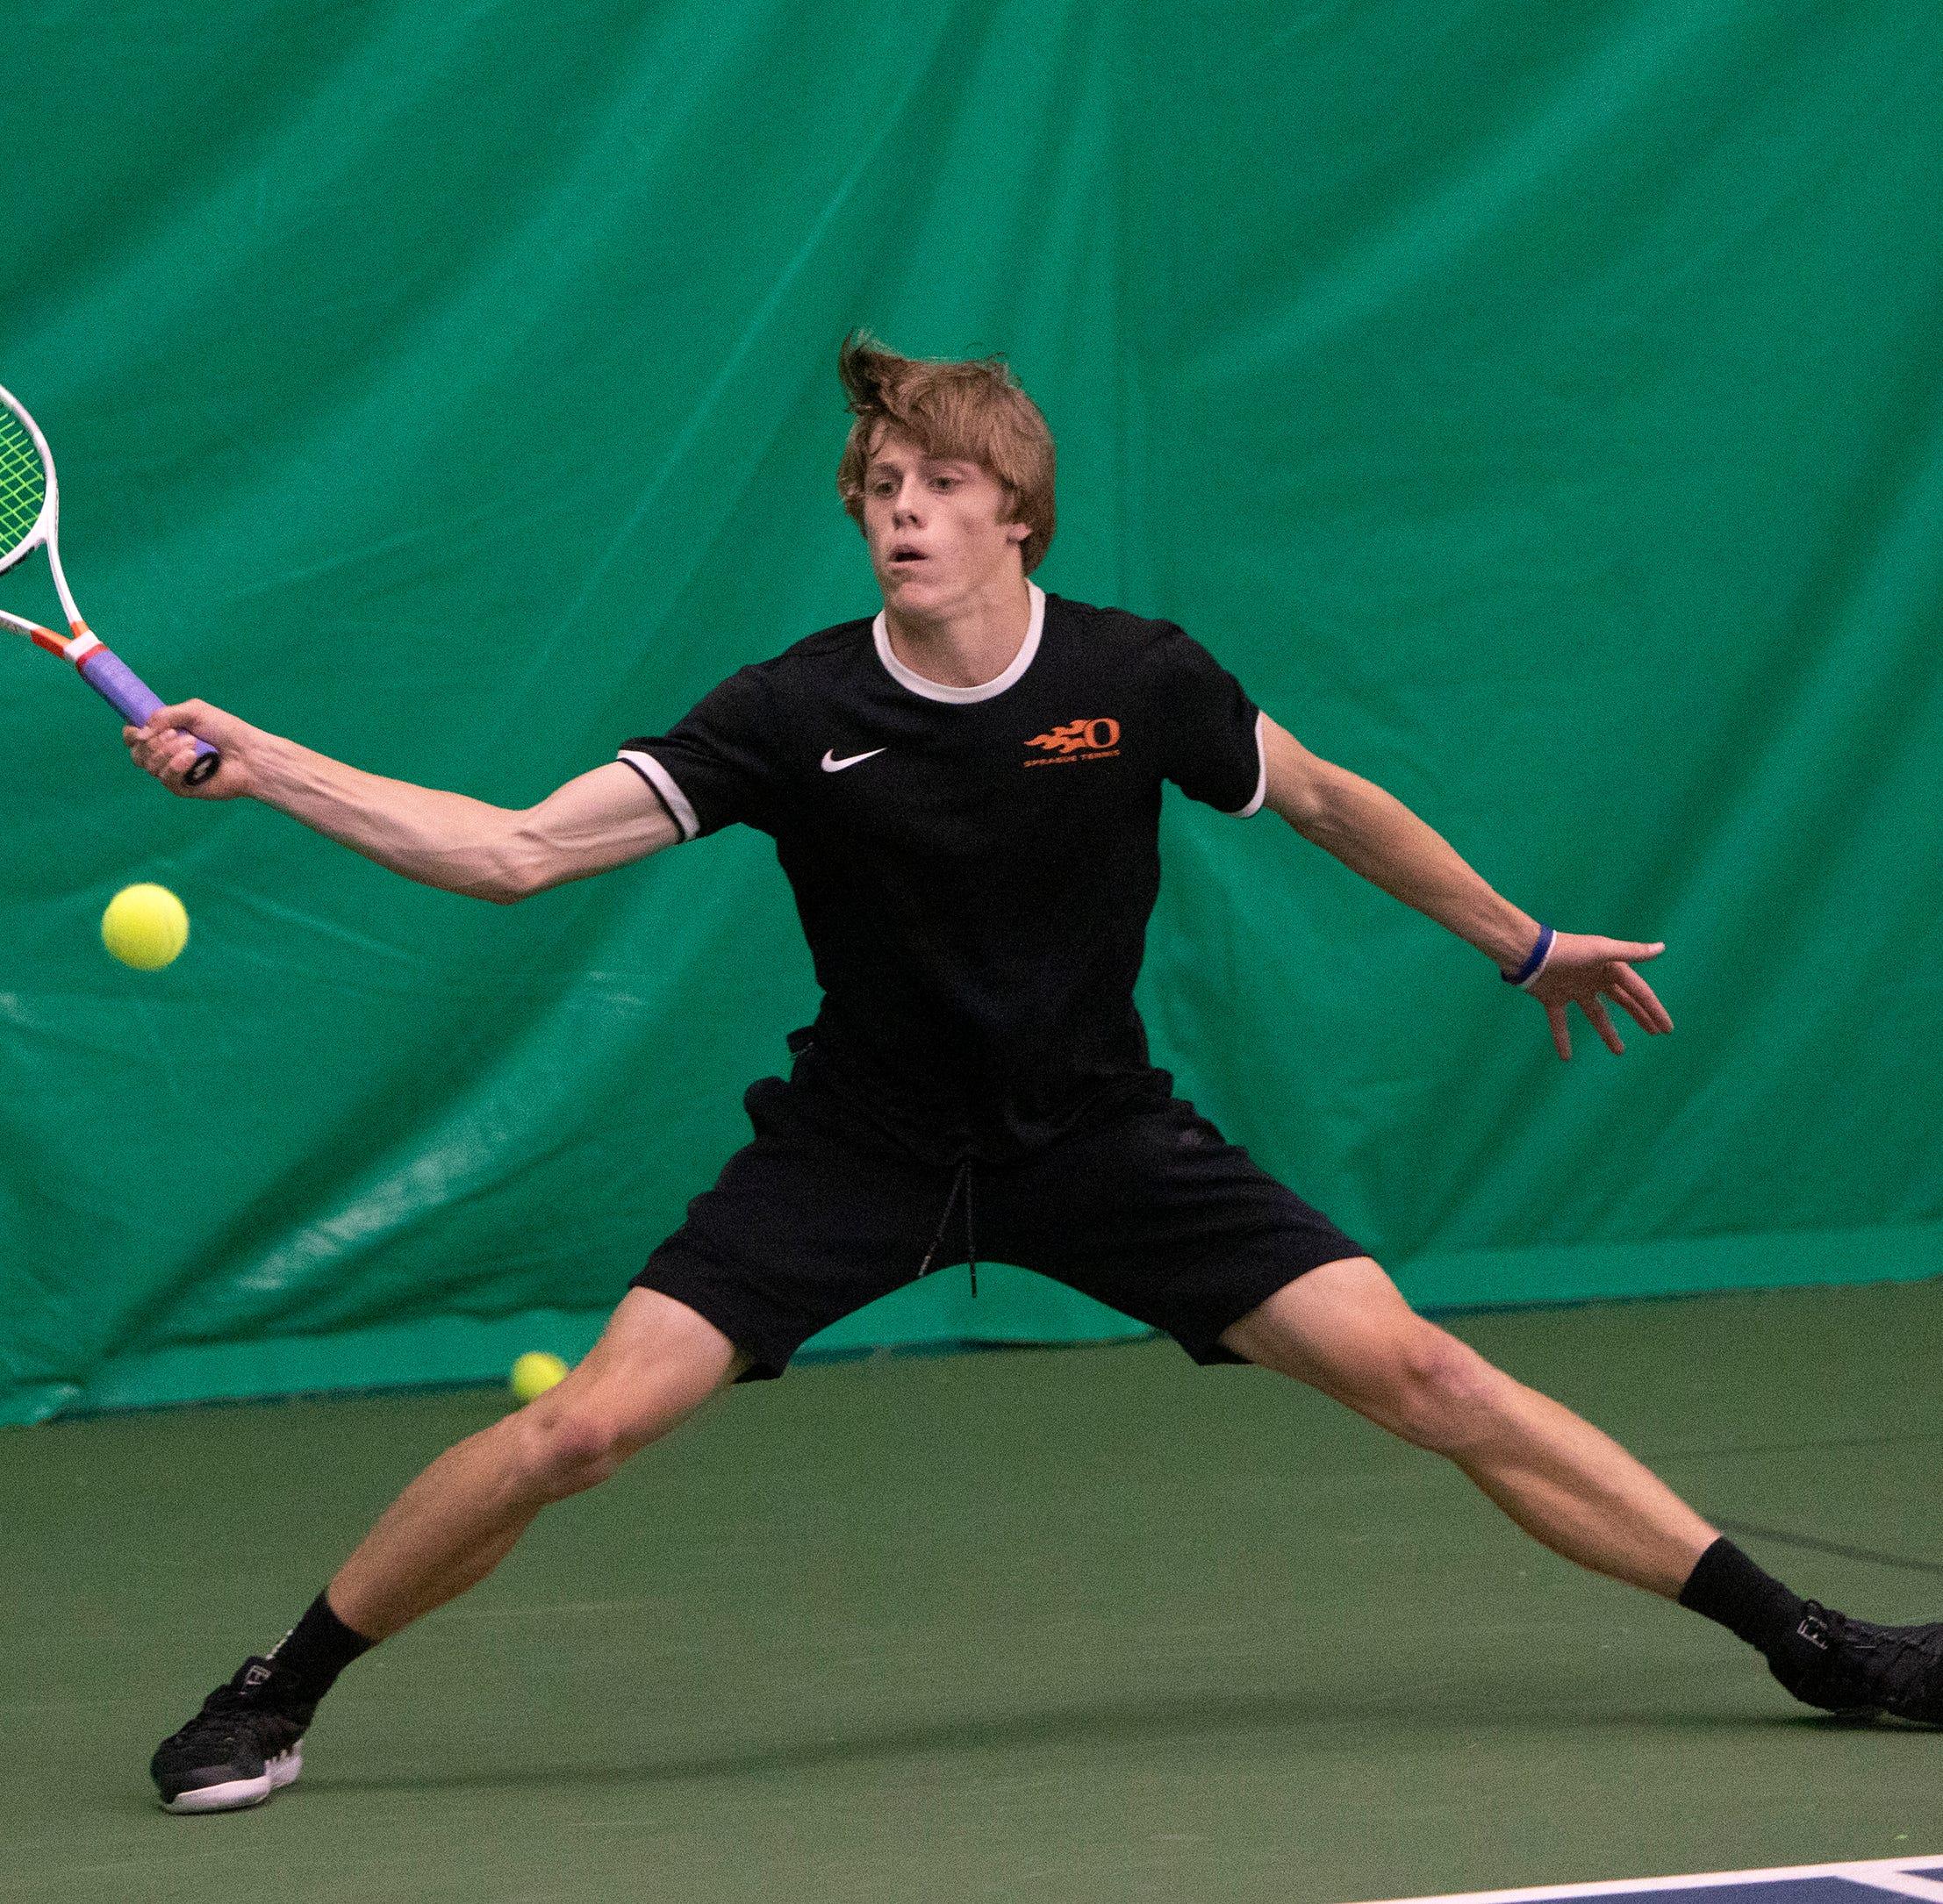 OSAA tennis: Sprague's Judson Blair cruises into state quarterfinals